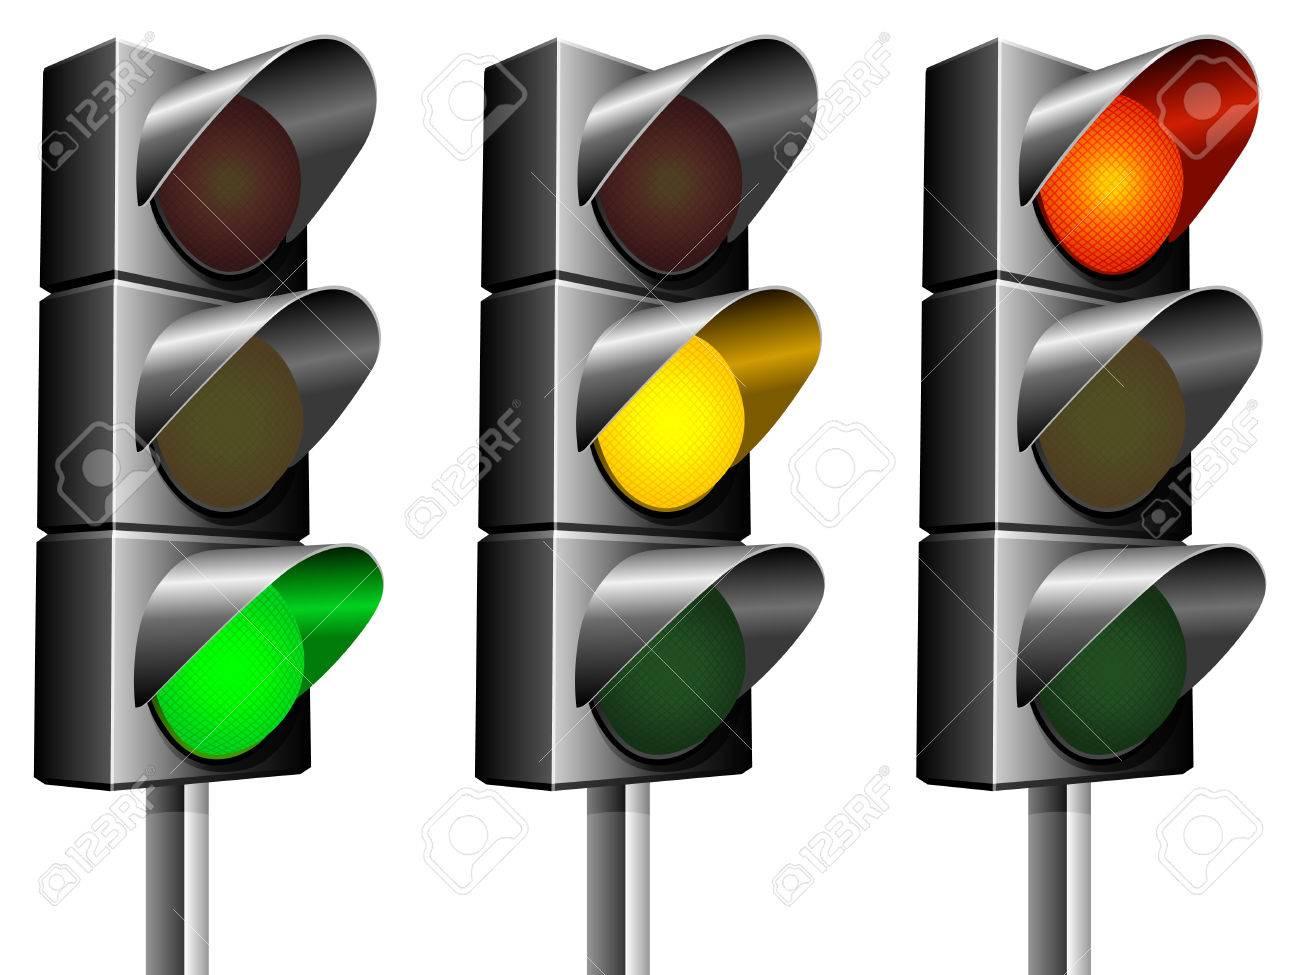 Traffic lights. - 6911702